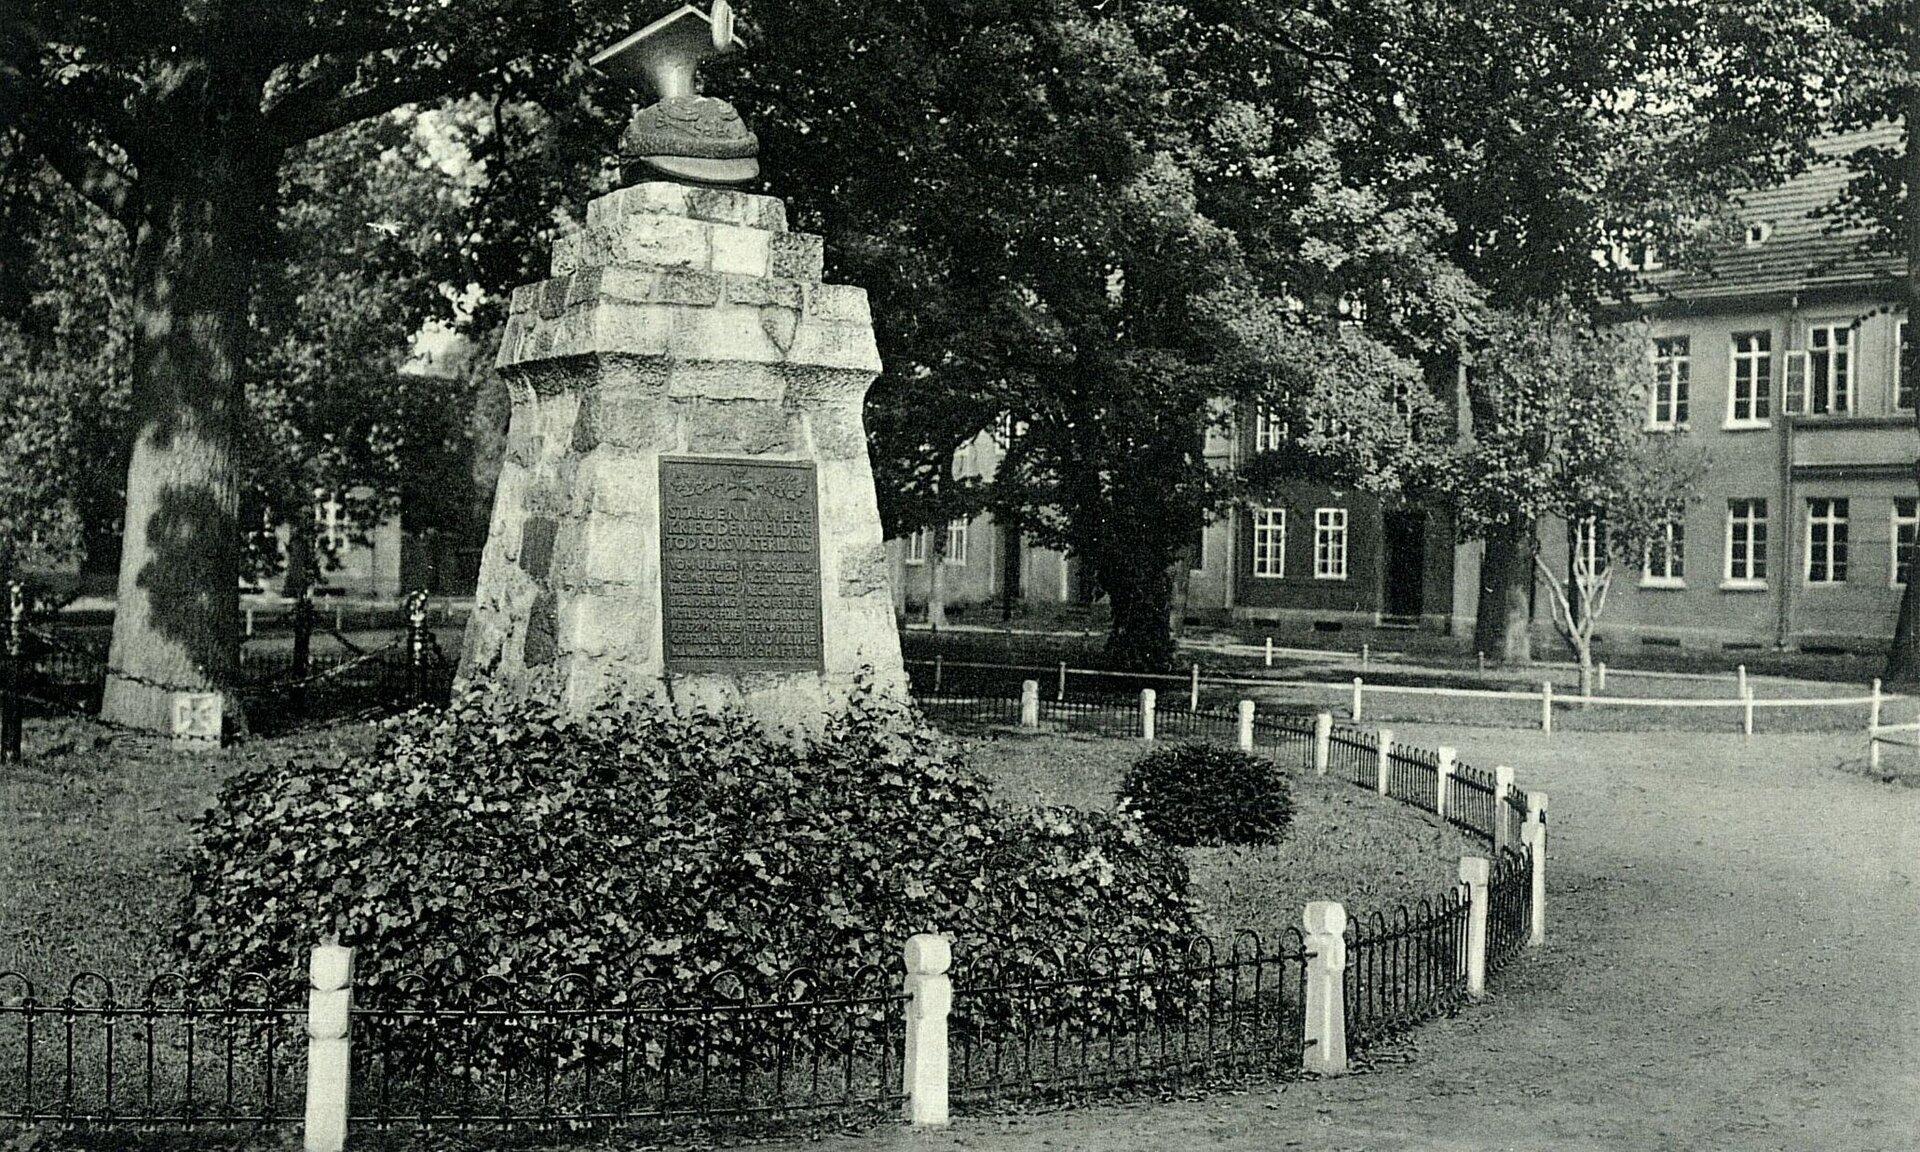 Foto: Stadtarchiv | Grahlplatz um 1925